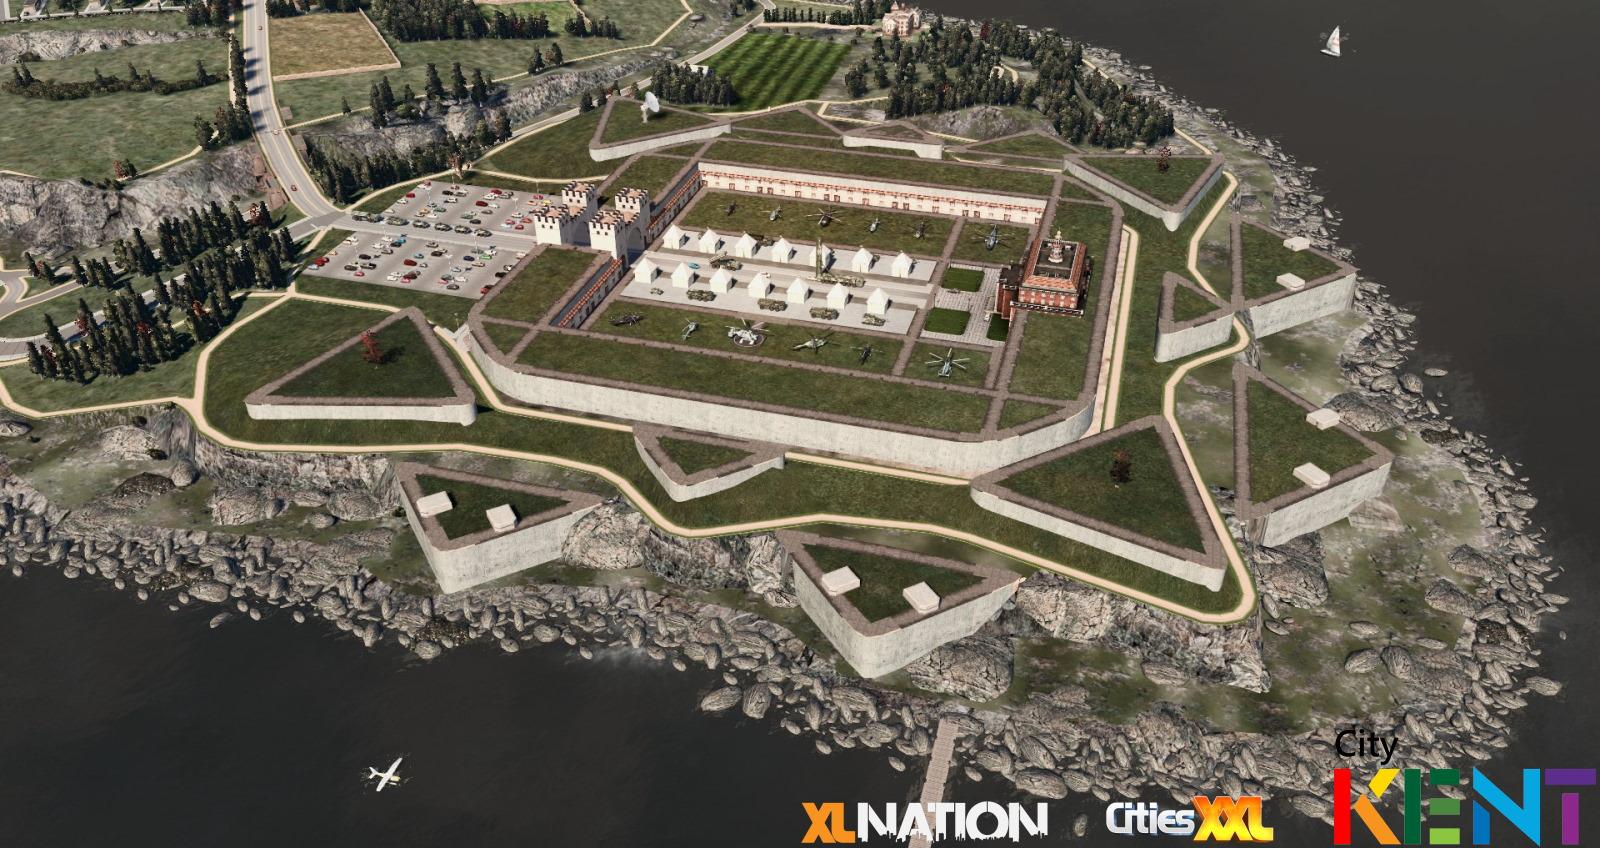 [Cities XXL] Kent - Page 2 Abraham-island_kent04_xln_citiesxxl-jpg